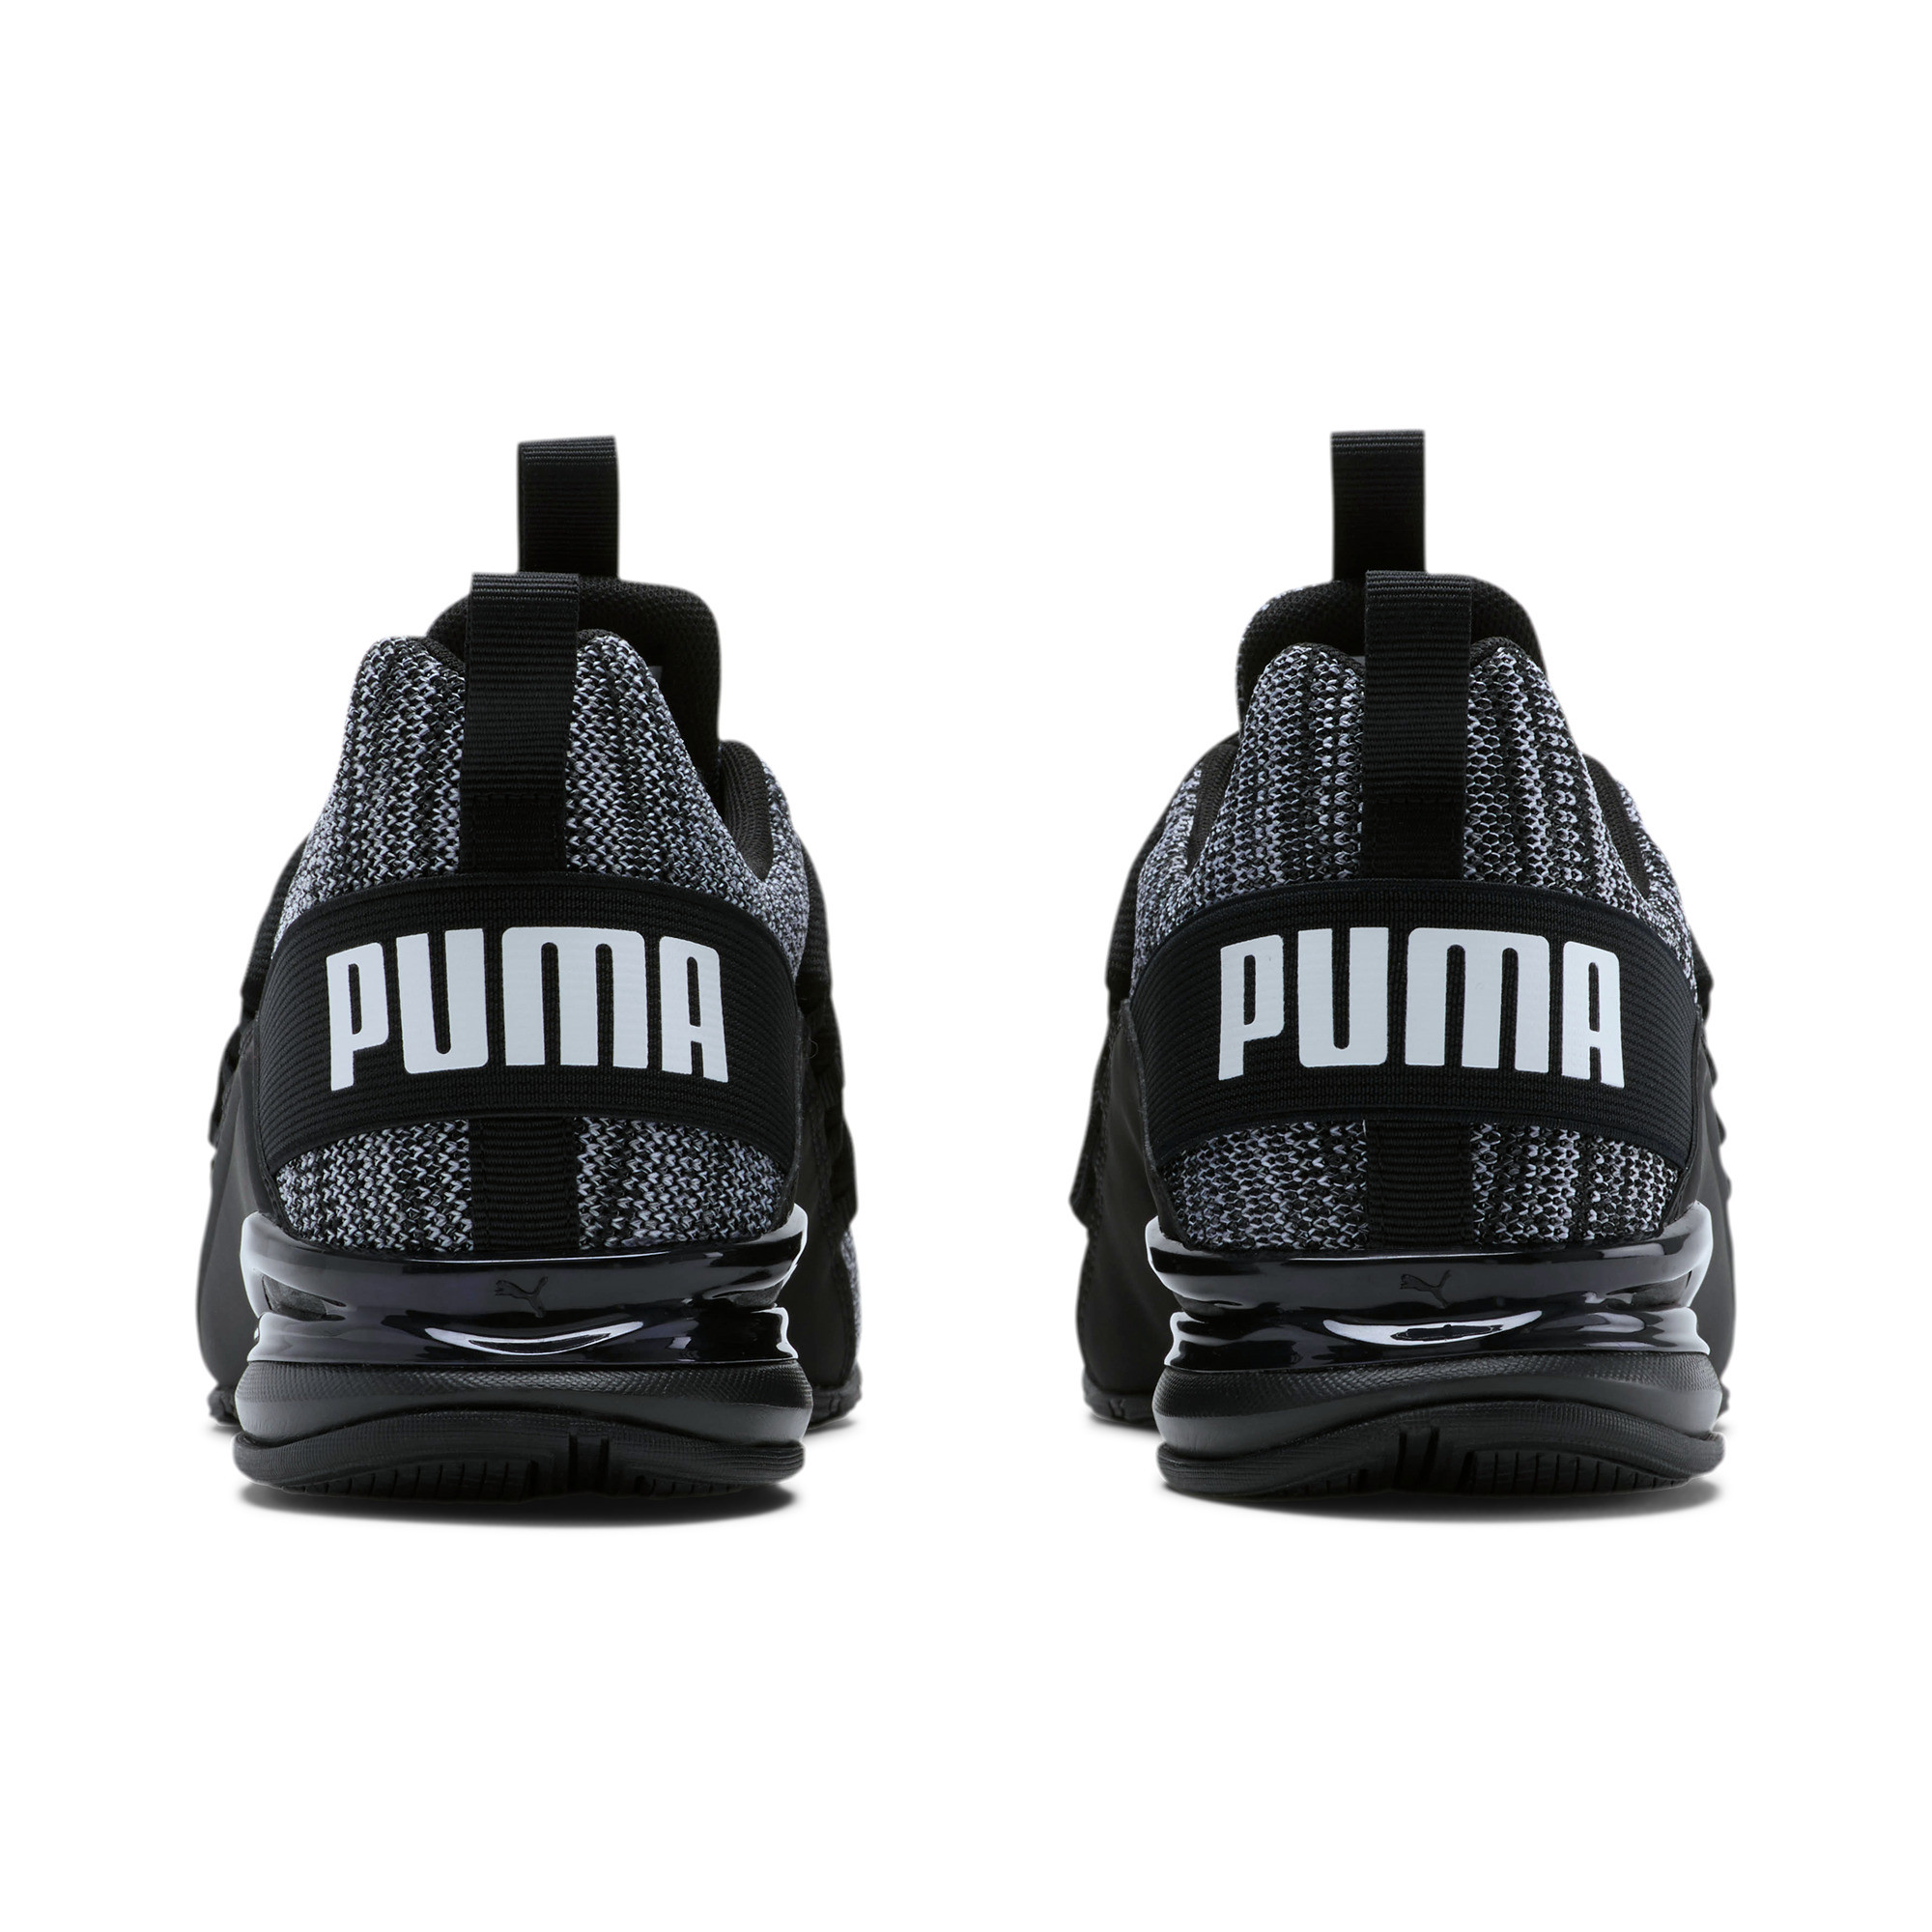 PUMA-Men-039-s-Momenta-Wide-Training-Shoes thumbnail 3